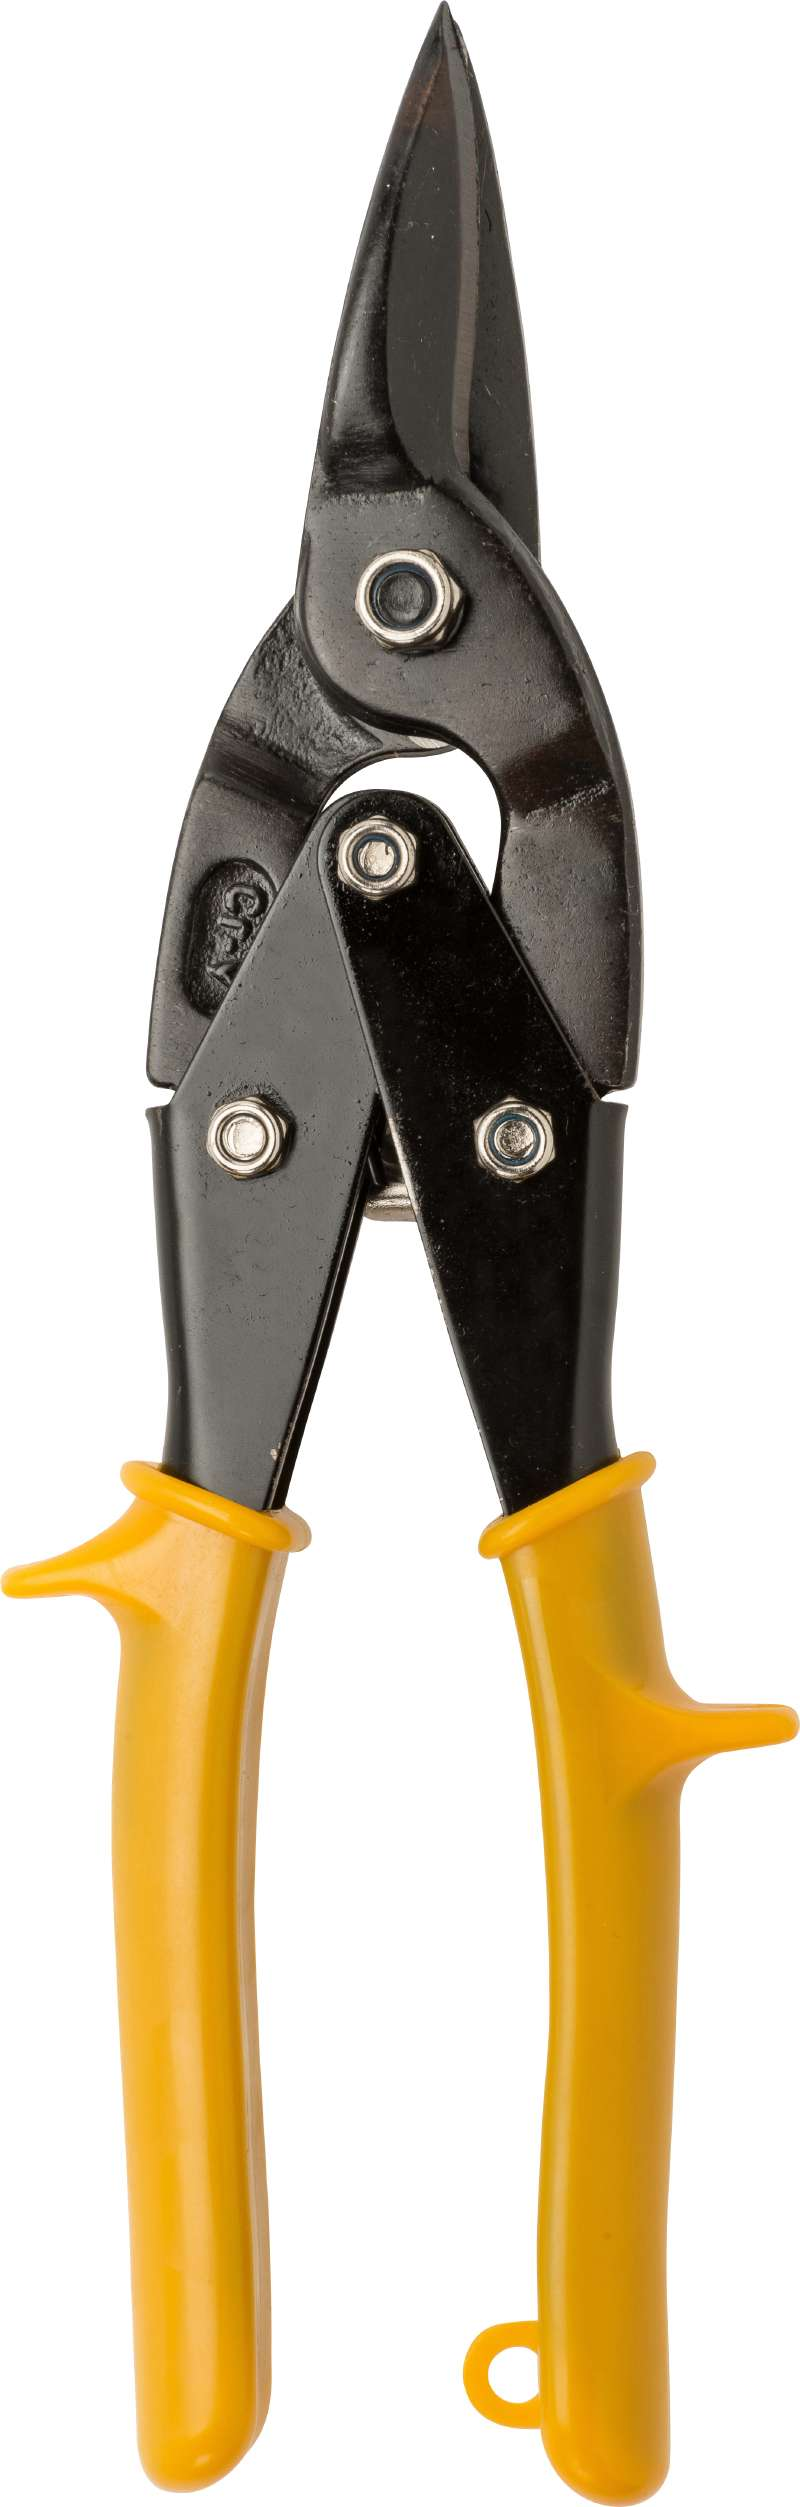 Ножницы по металлу Kwb 9263-00